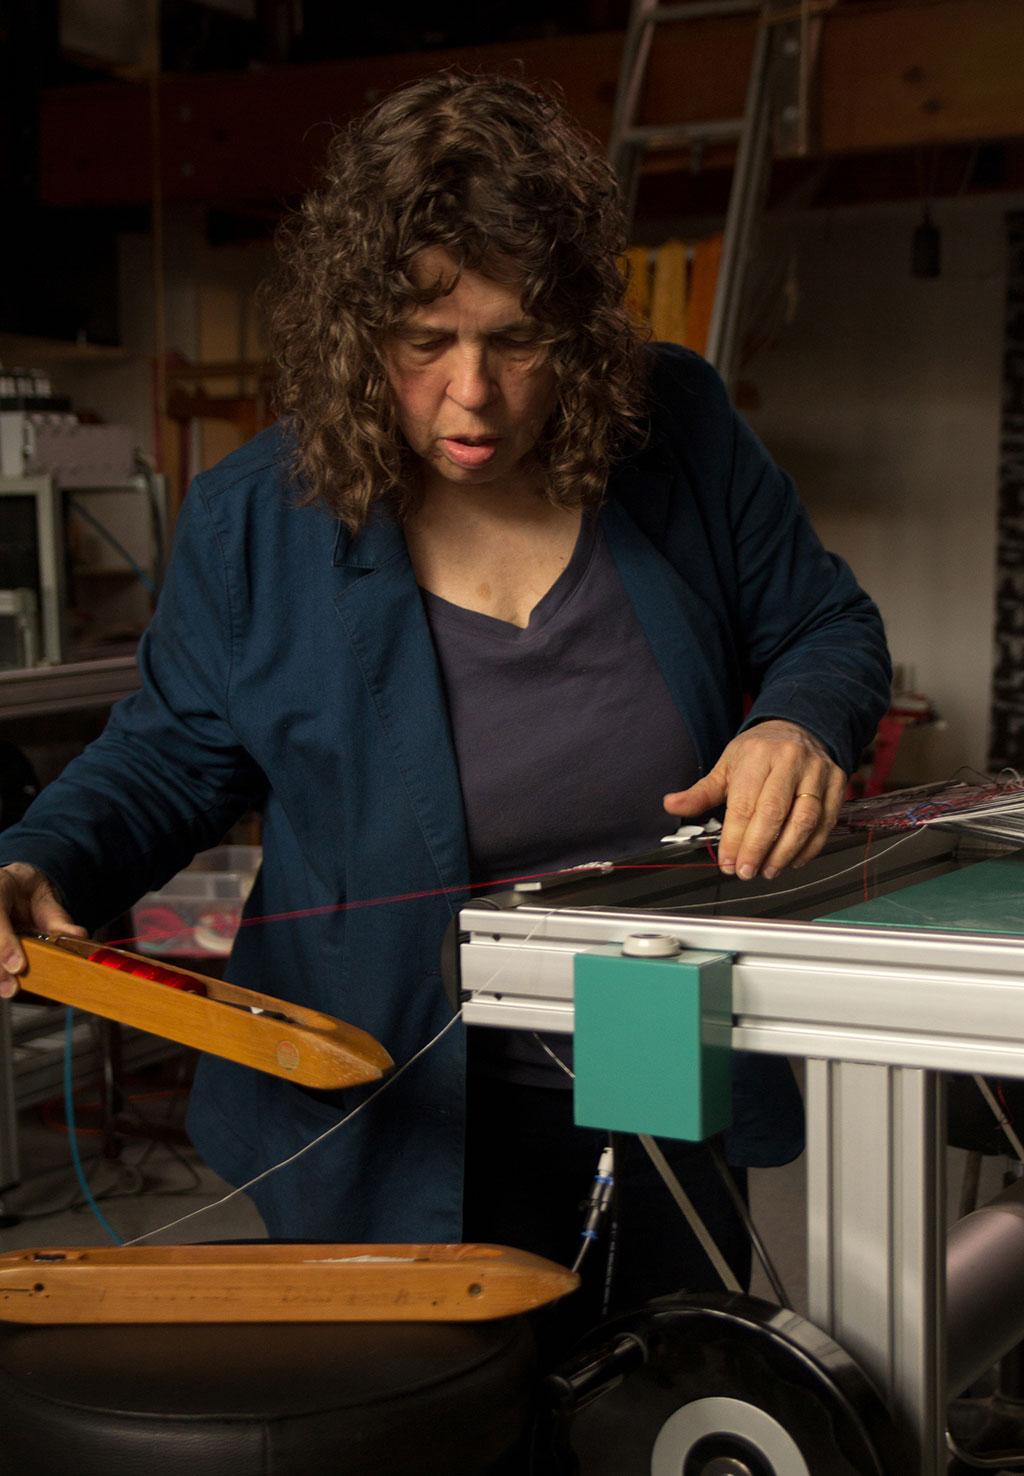 Lia Cook at the loom. Mark Markley photograph